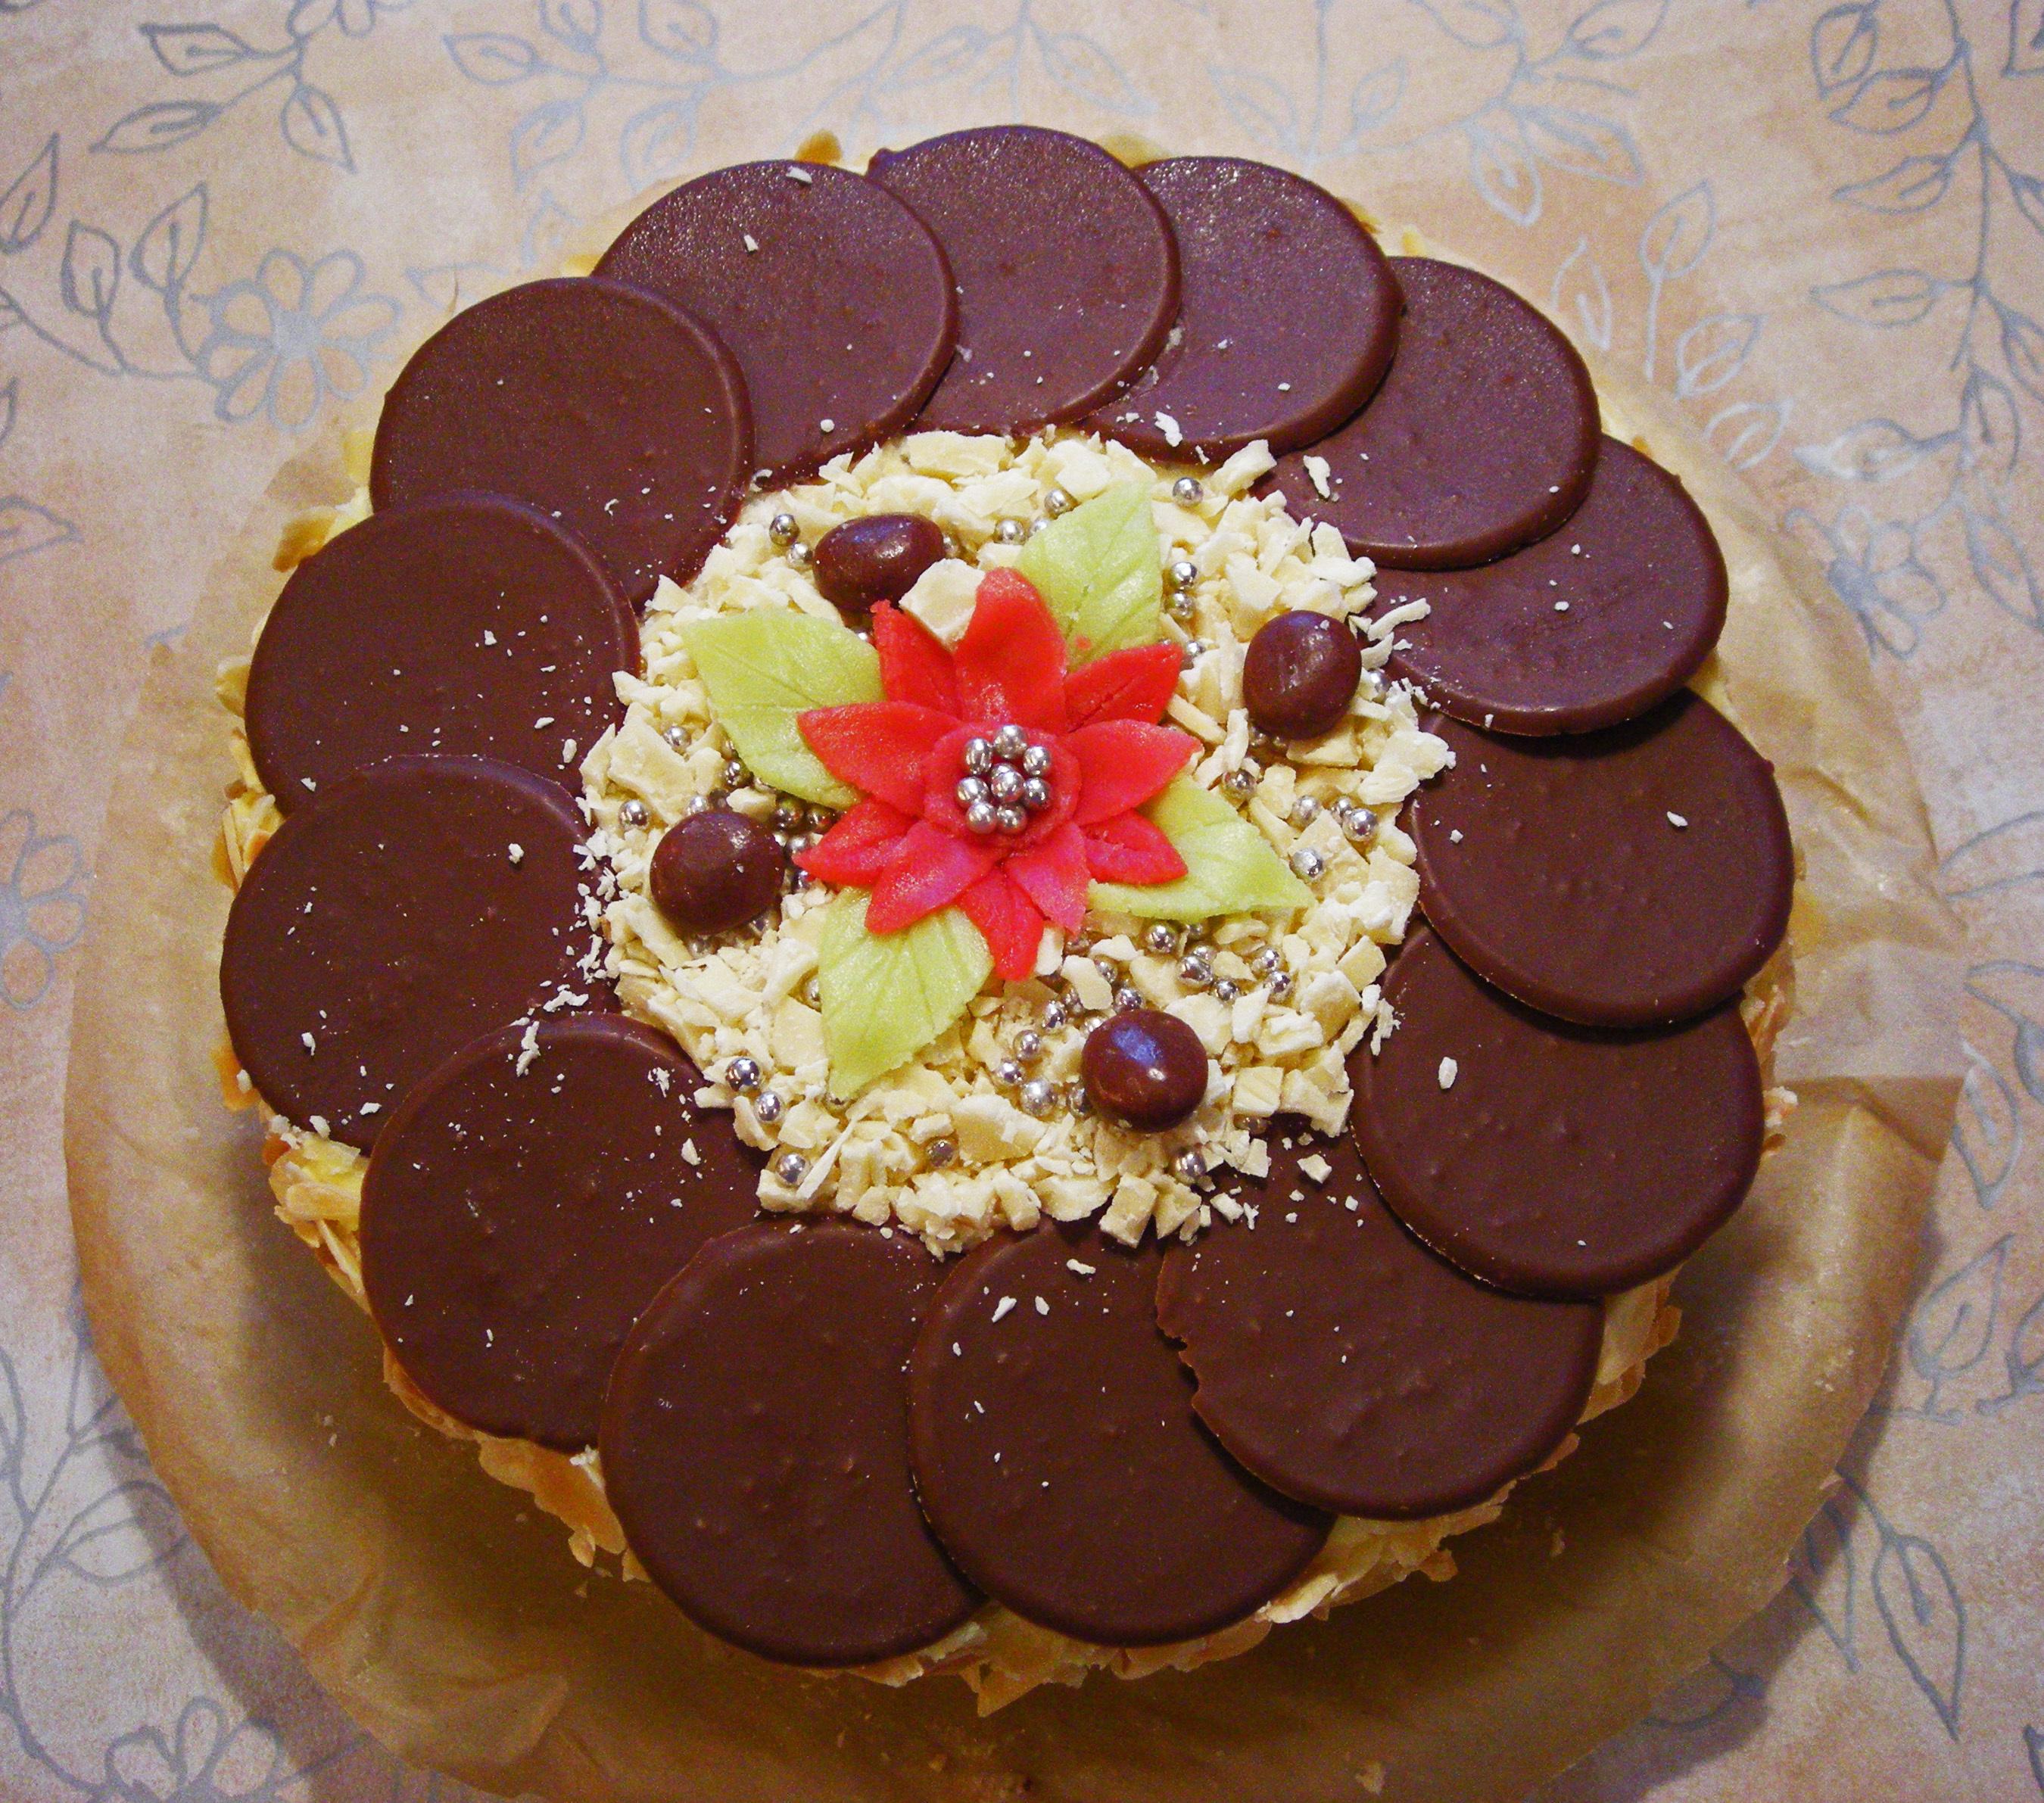 Marängtårta med dumle- & vitchokladhasselnötsmousse